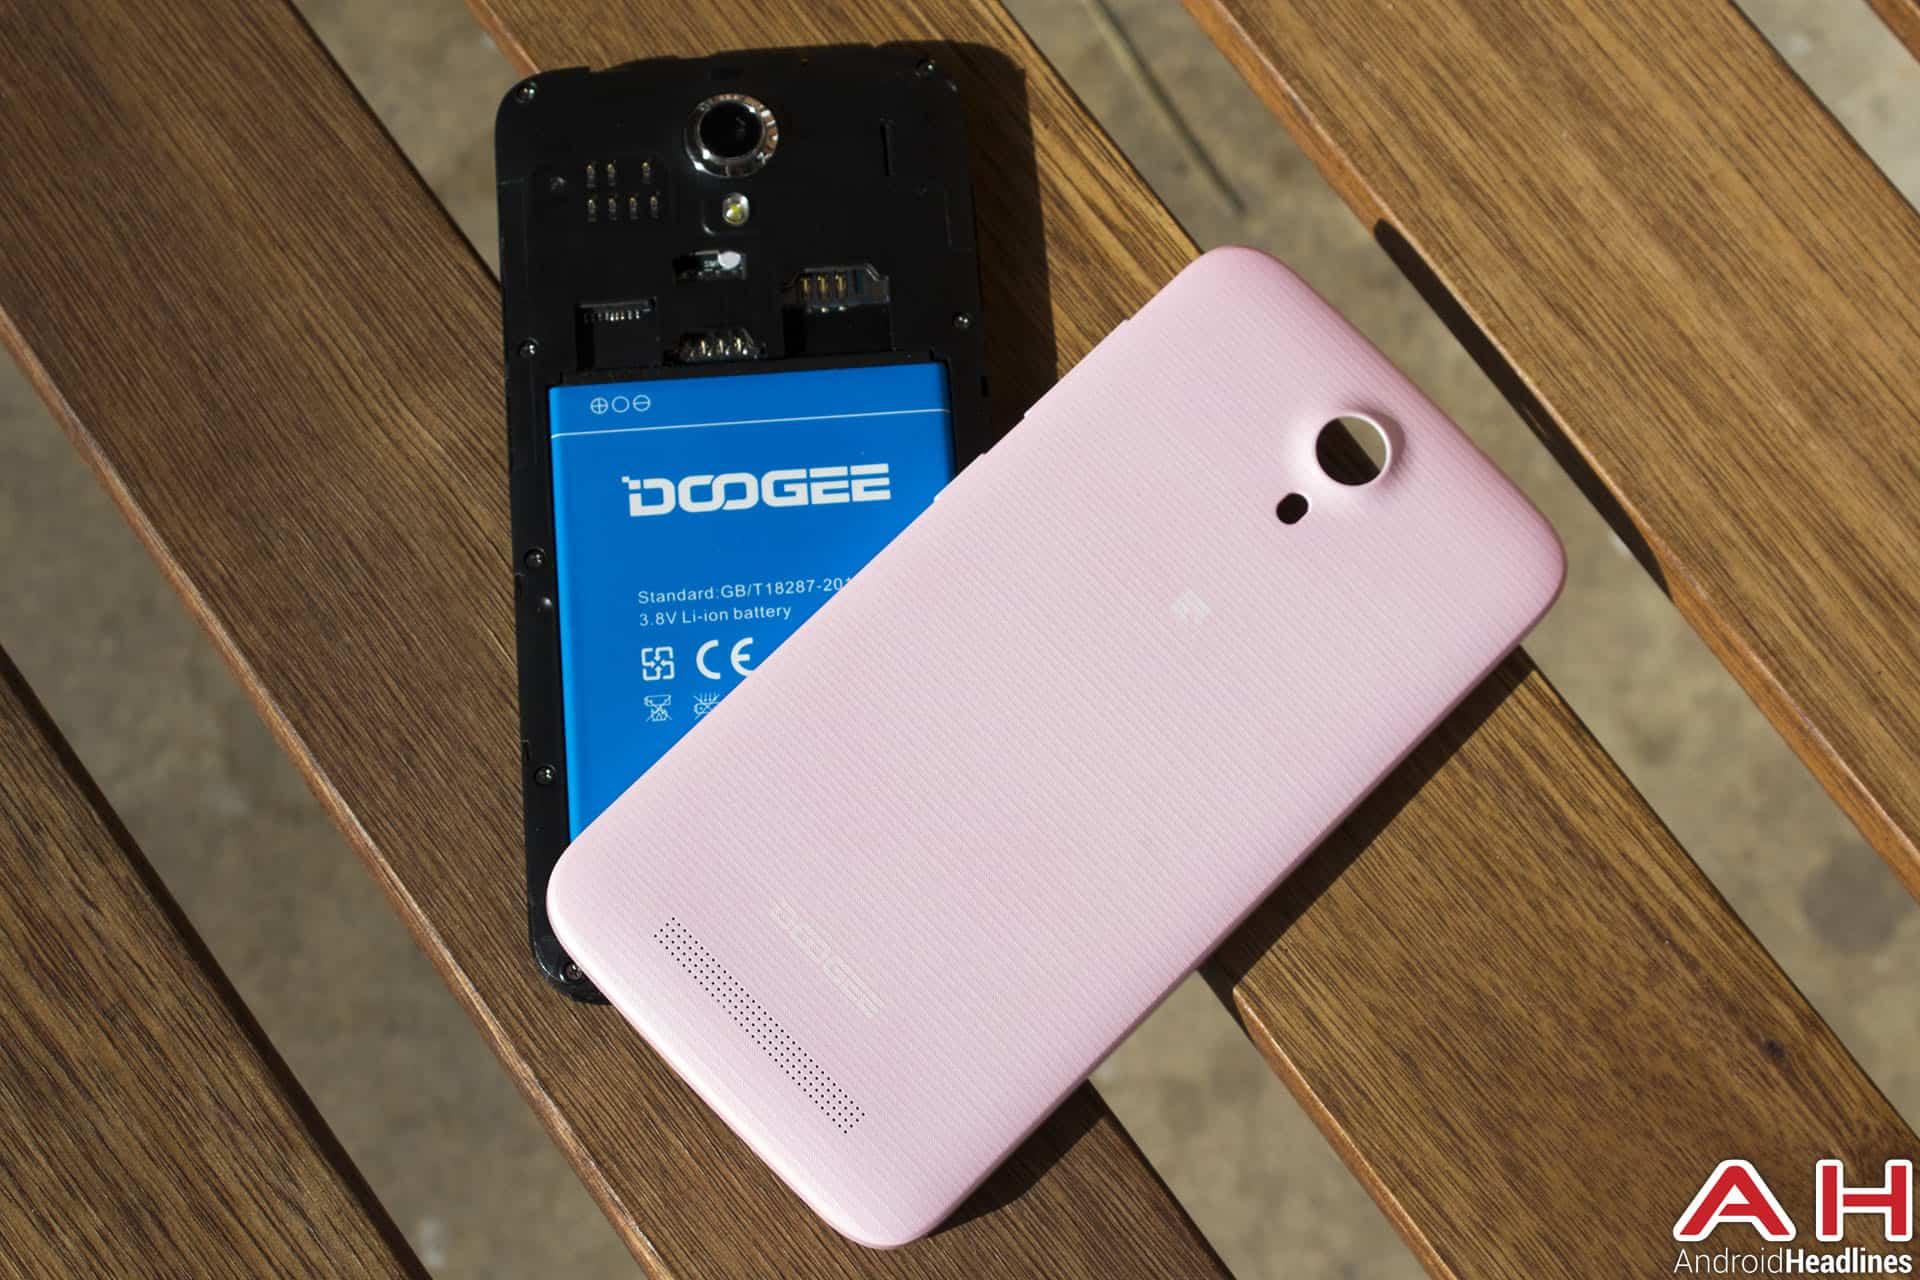 Doogee-Valencia-2-Y100-Review-AH-battery